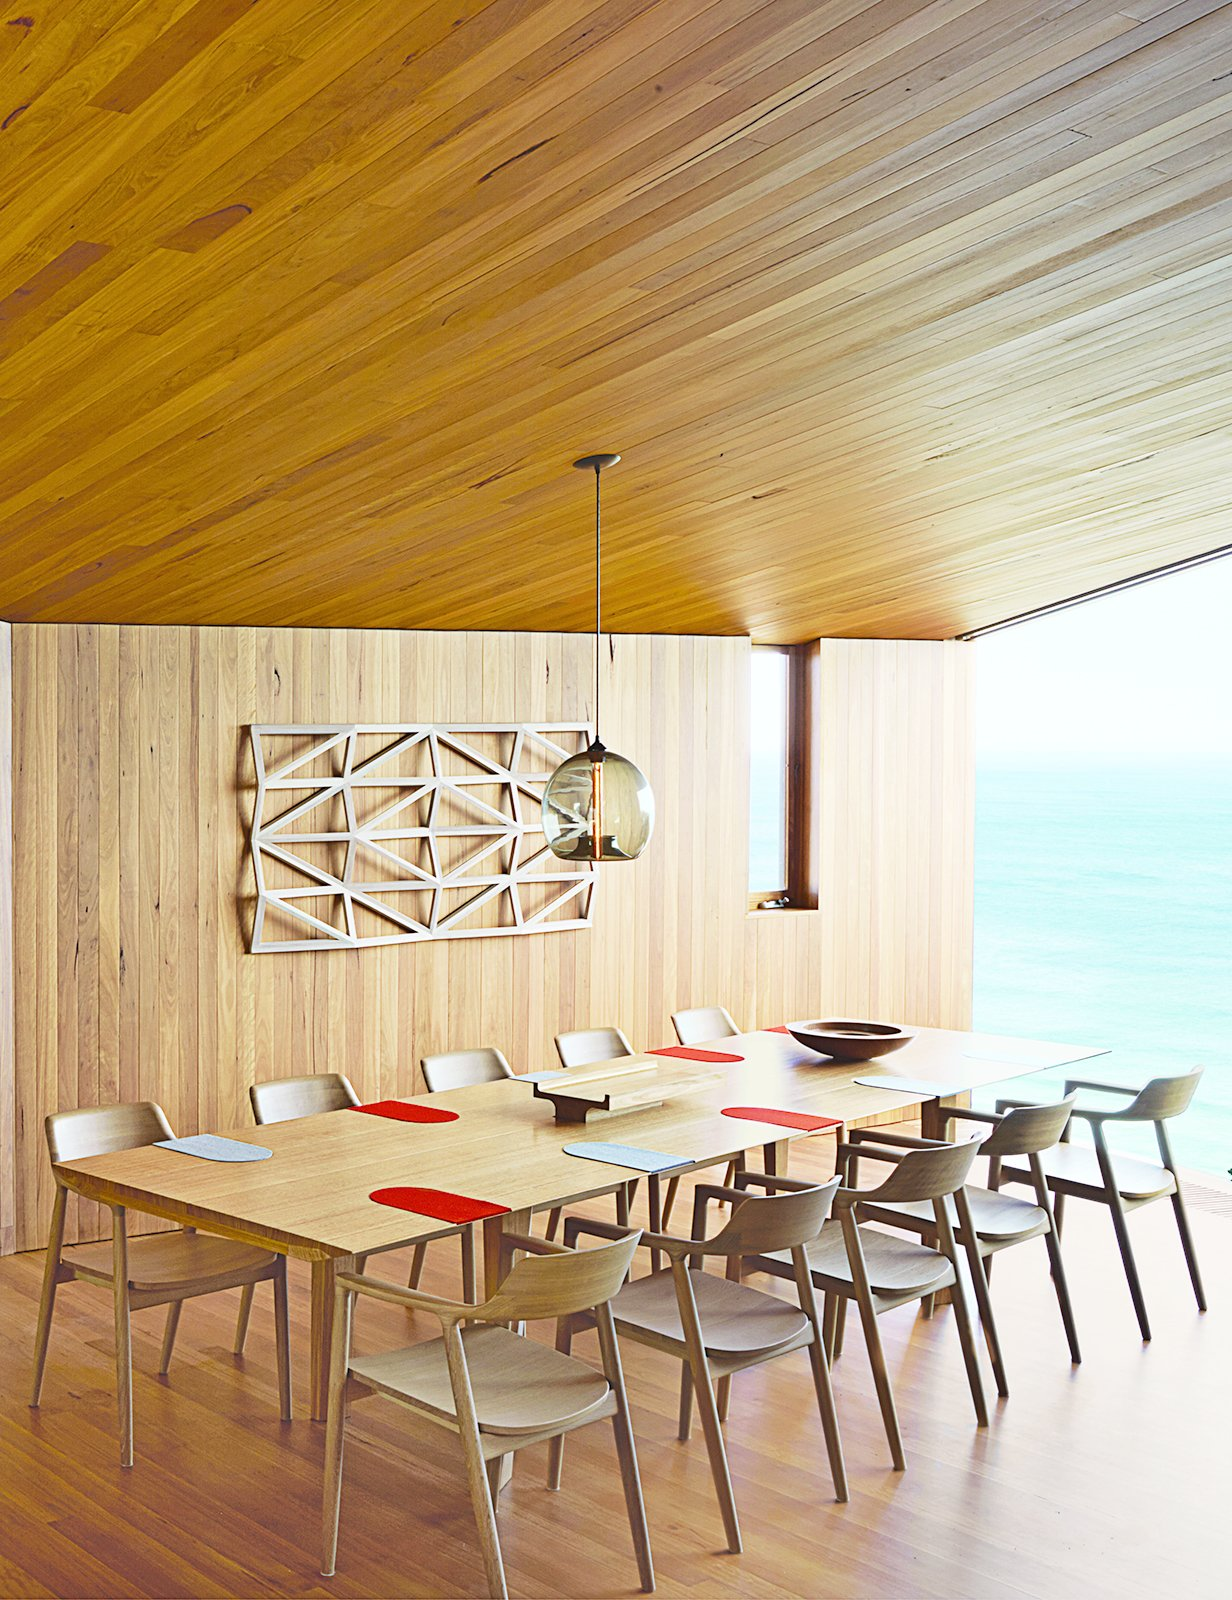 Dining Room Chair Pendant Lighting Table And Medium Hardwood Floor Wardle S Firm